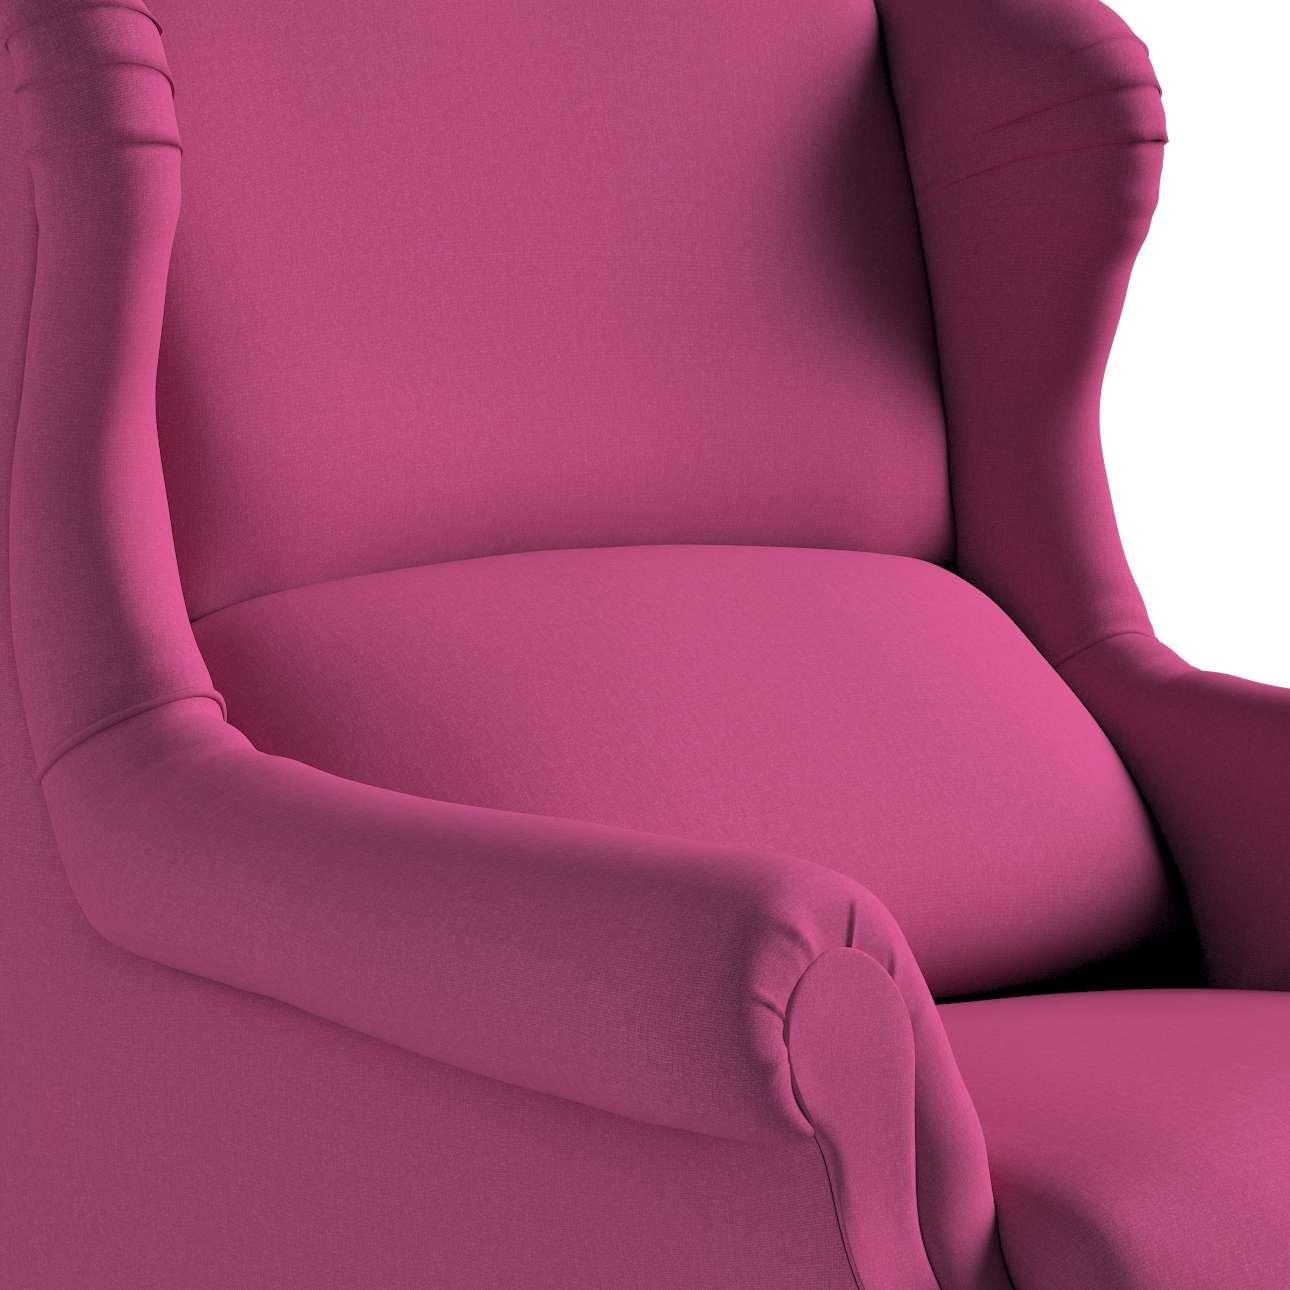 Fotel Unique w kolekcji Living, tkanina: 161-29